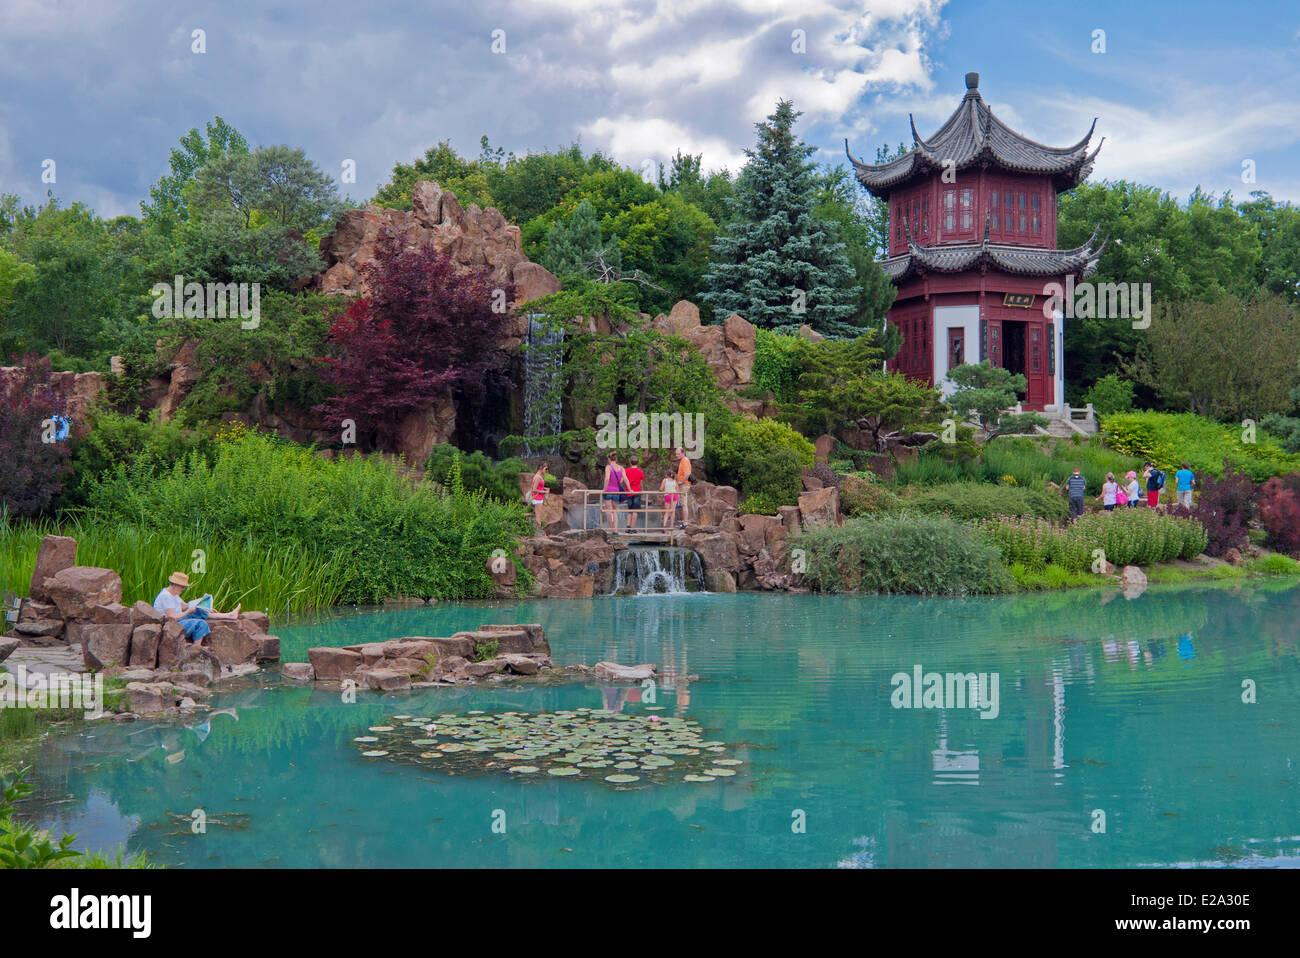 Kanada, Provinz Quebec, Montreal, Botanischer Garten, chinesischer Garten Stockbild